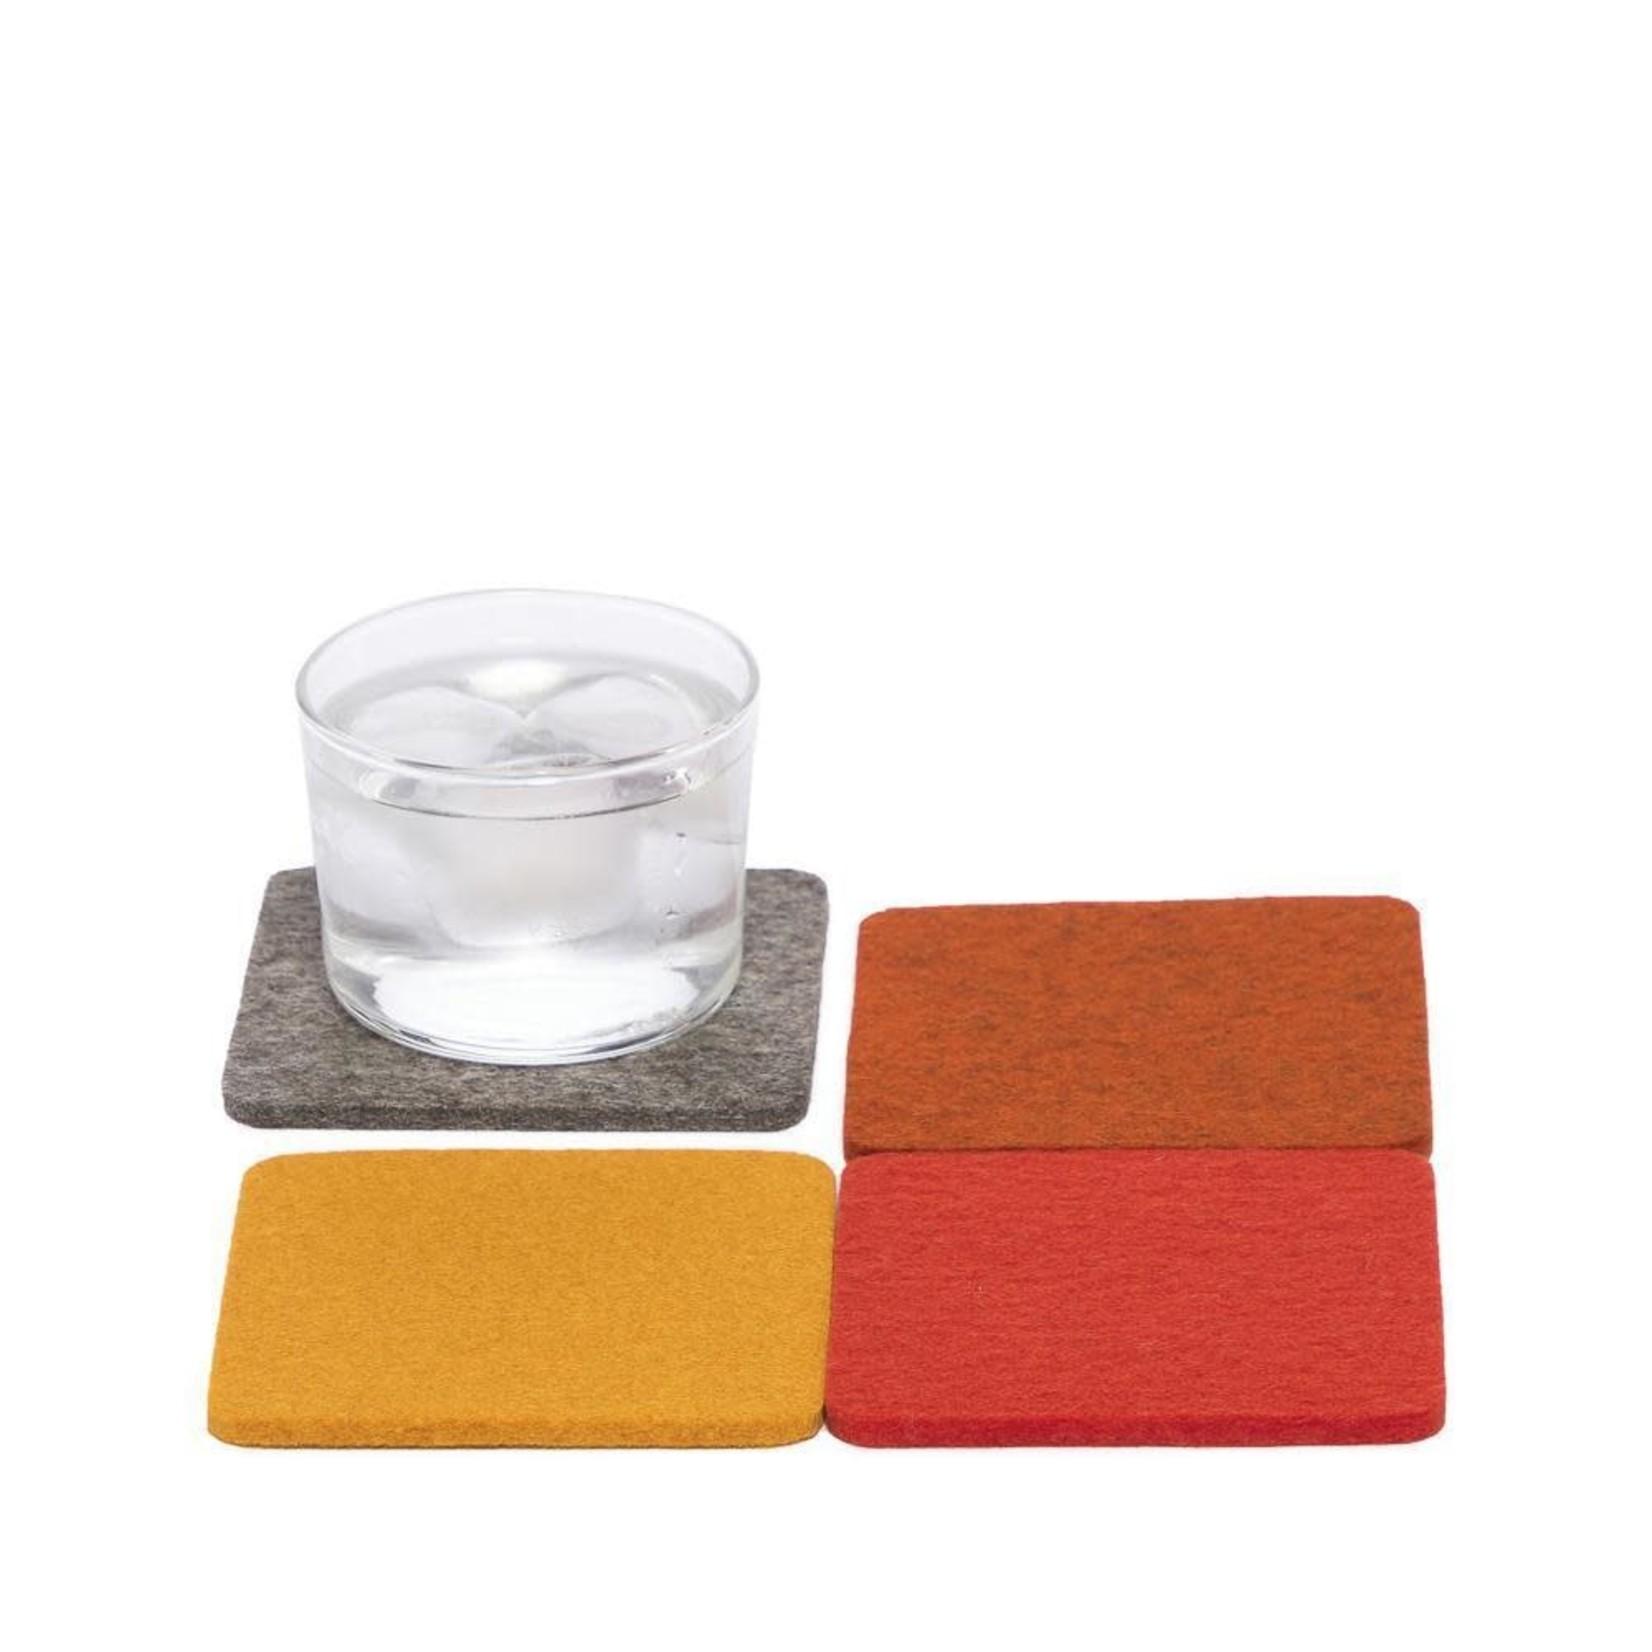 Graf & Lantz Graf & Lantz Coaster square 4 pack Flame